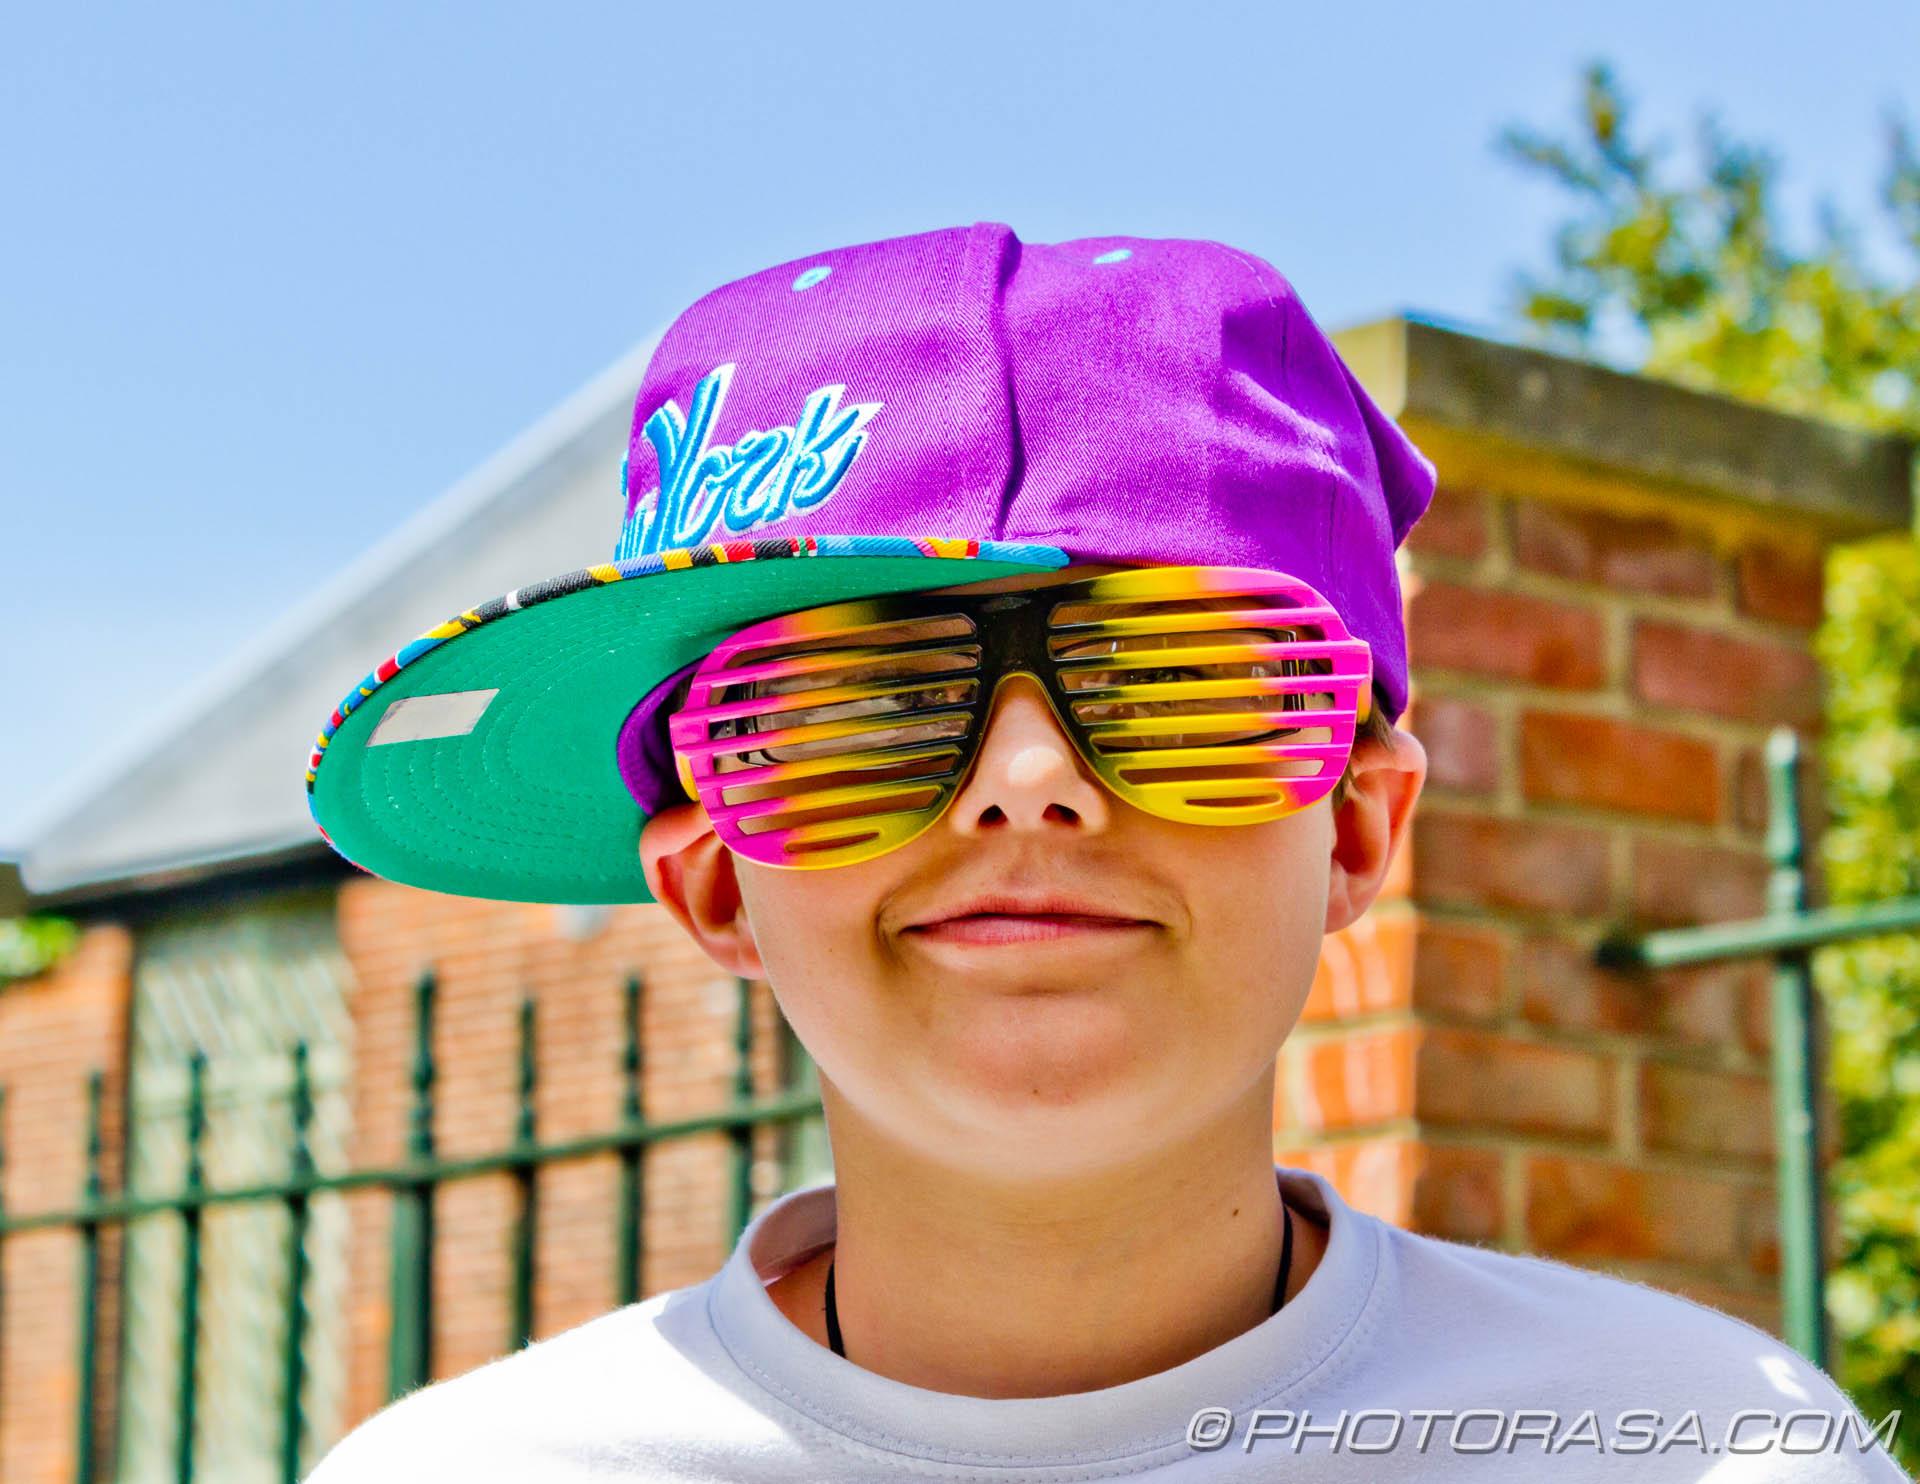 http://photorasa.com/canterbury-trip/colourful-french-kid/